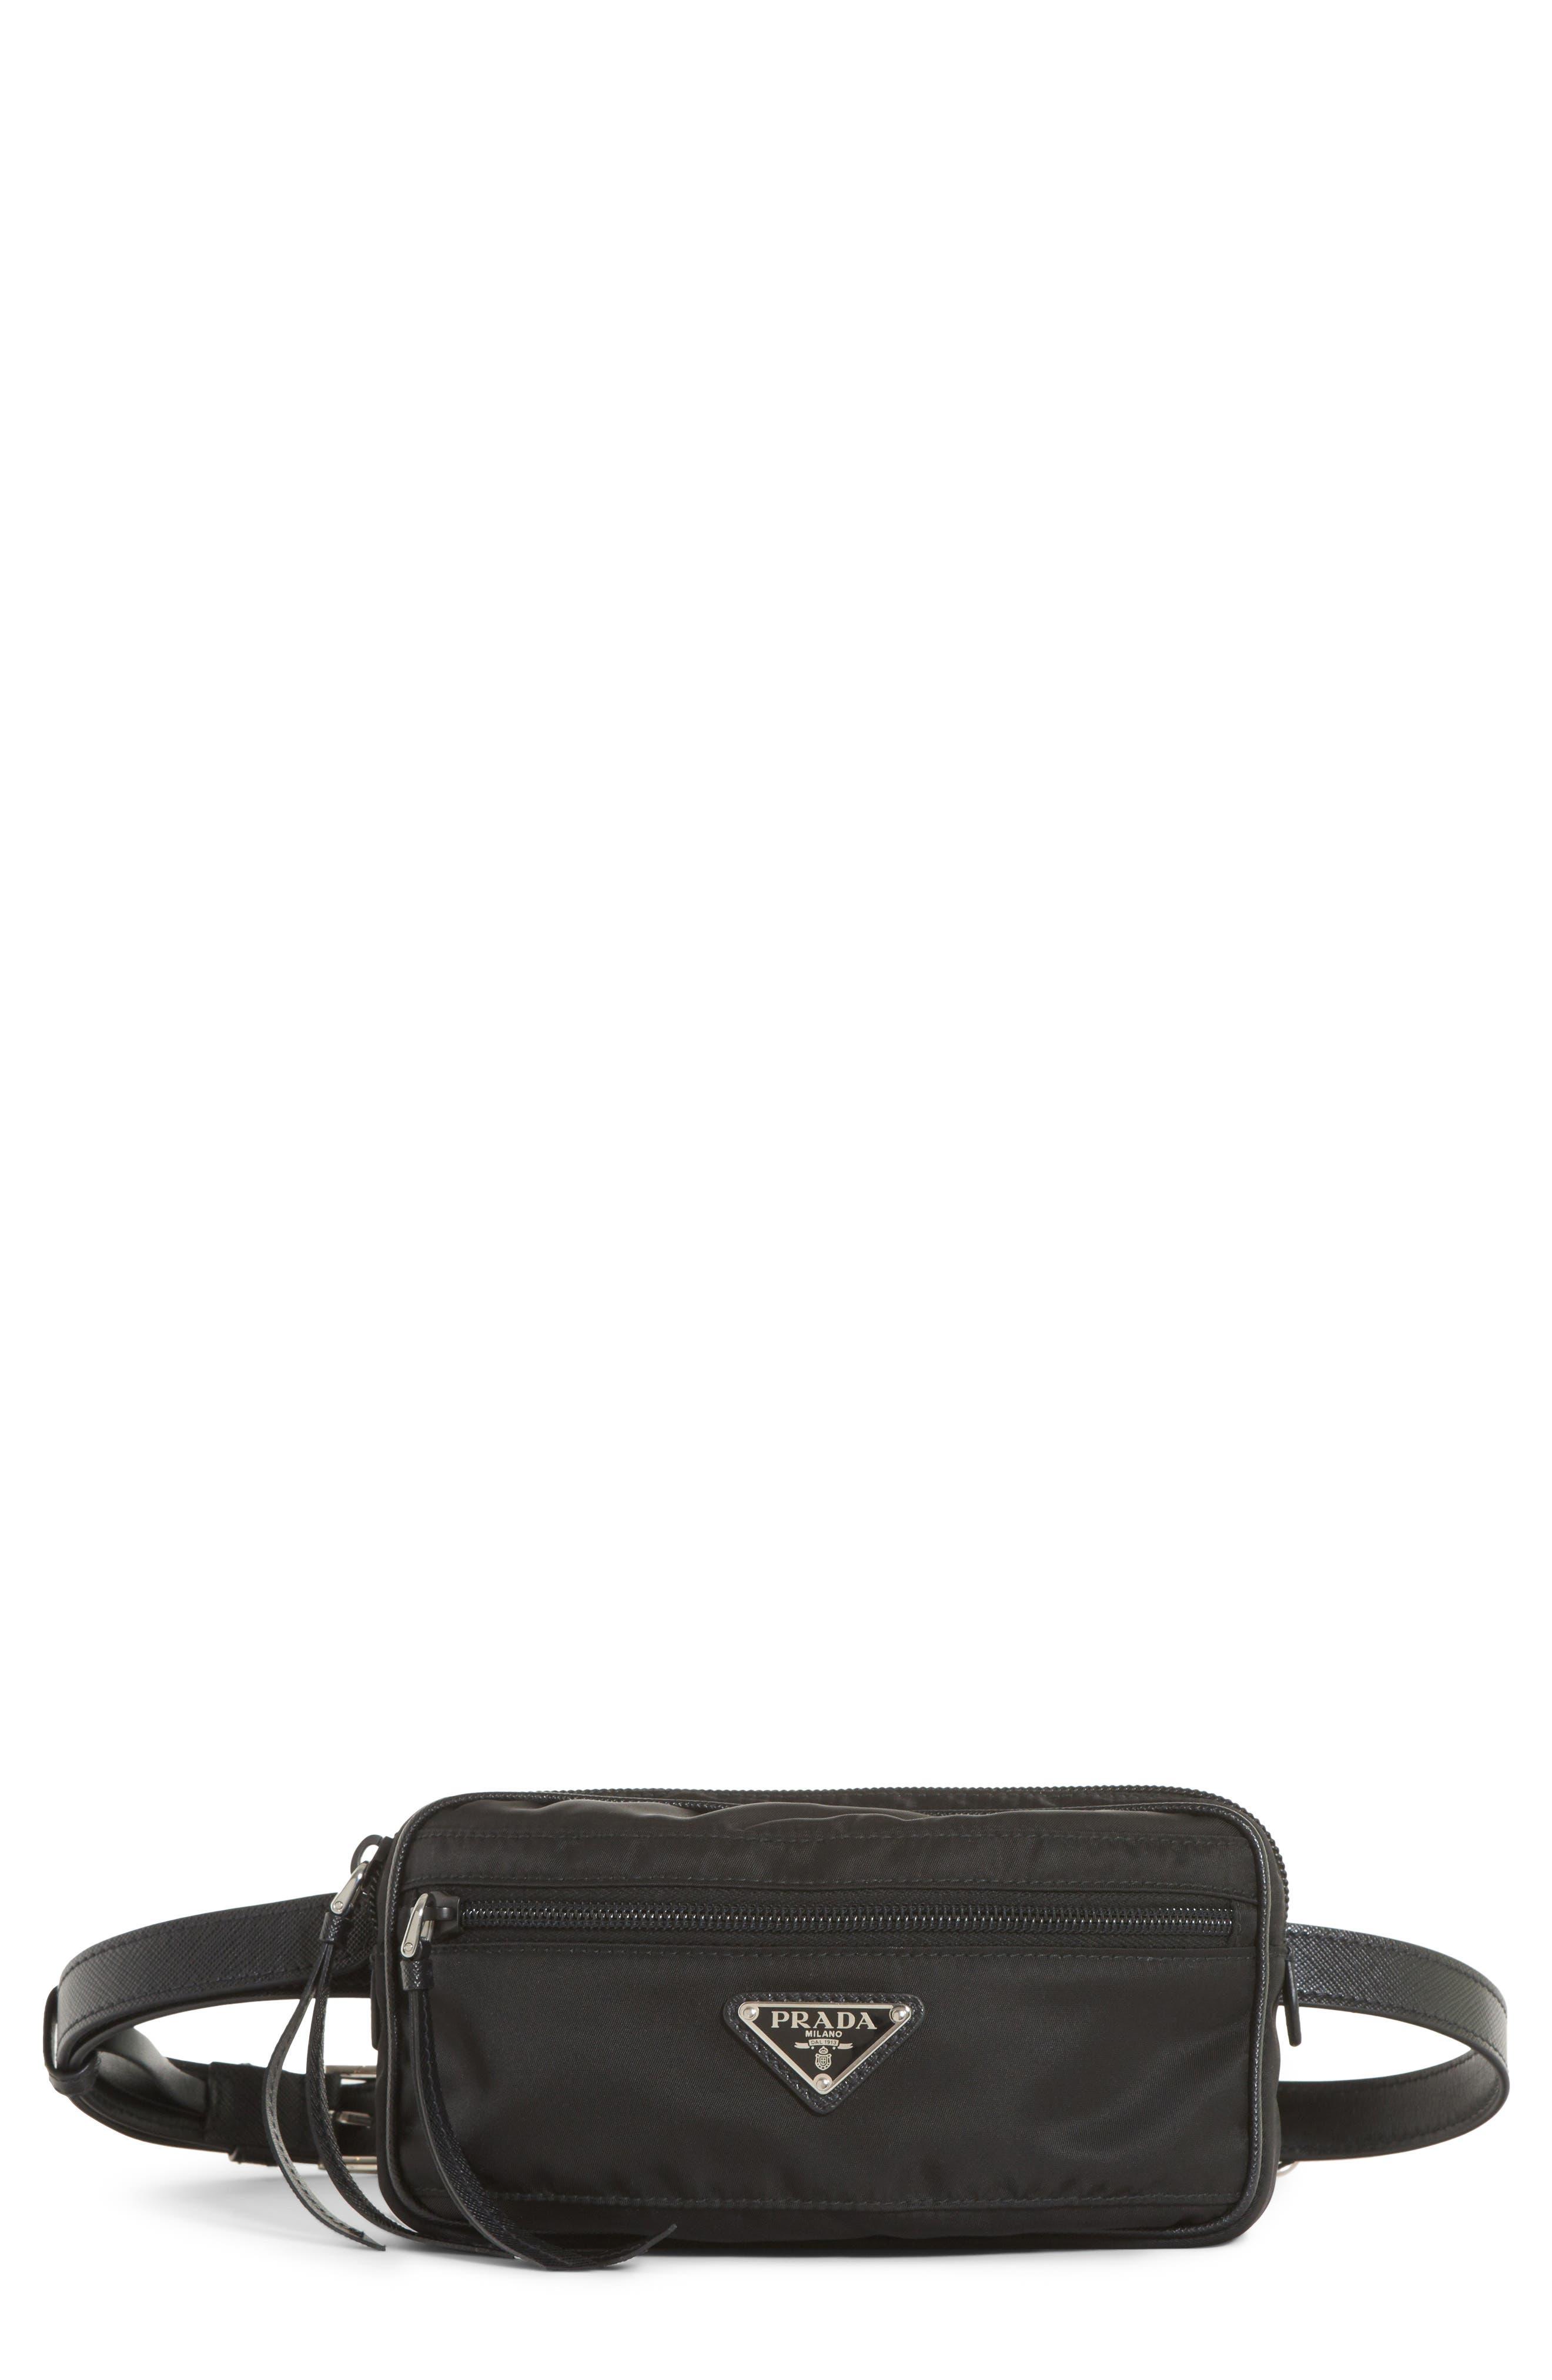 451049033edd Prada Crossbody Bags | Nordstrom